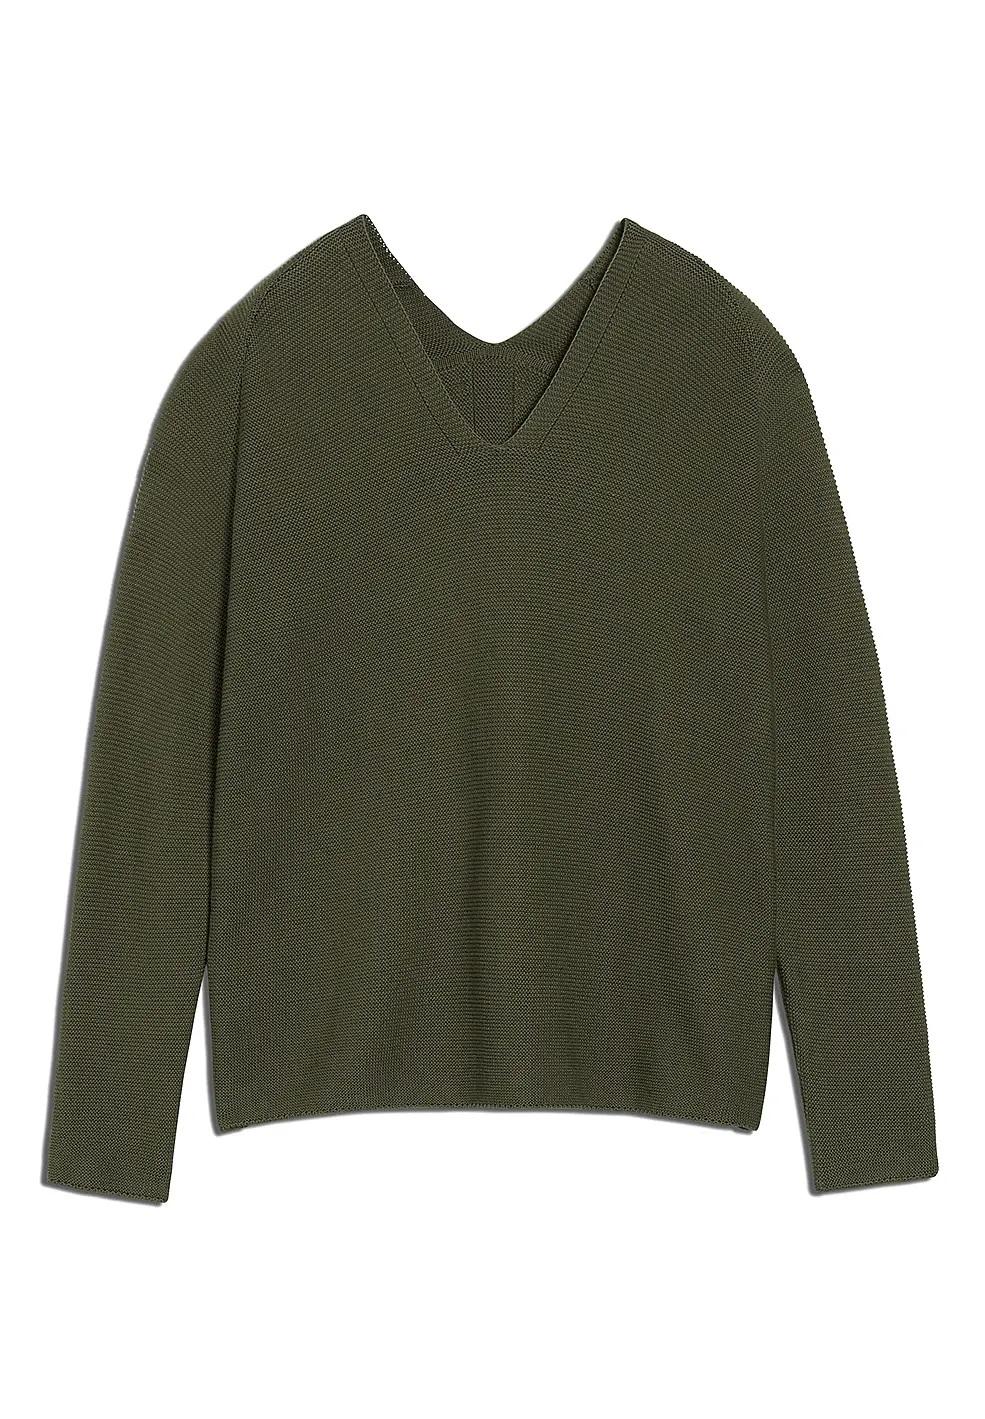 faarina-knit-mossgreen-3